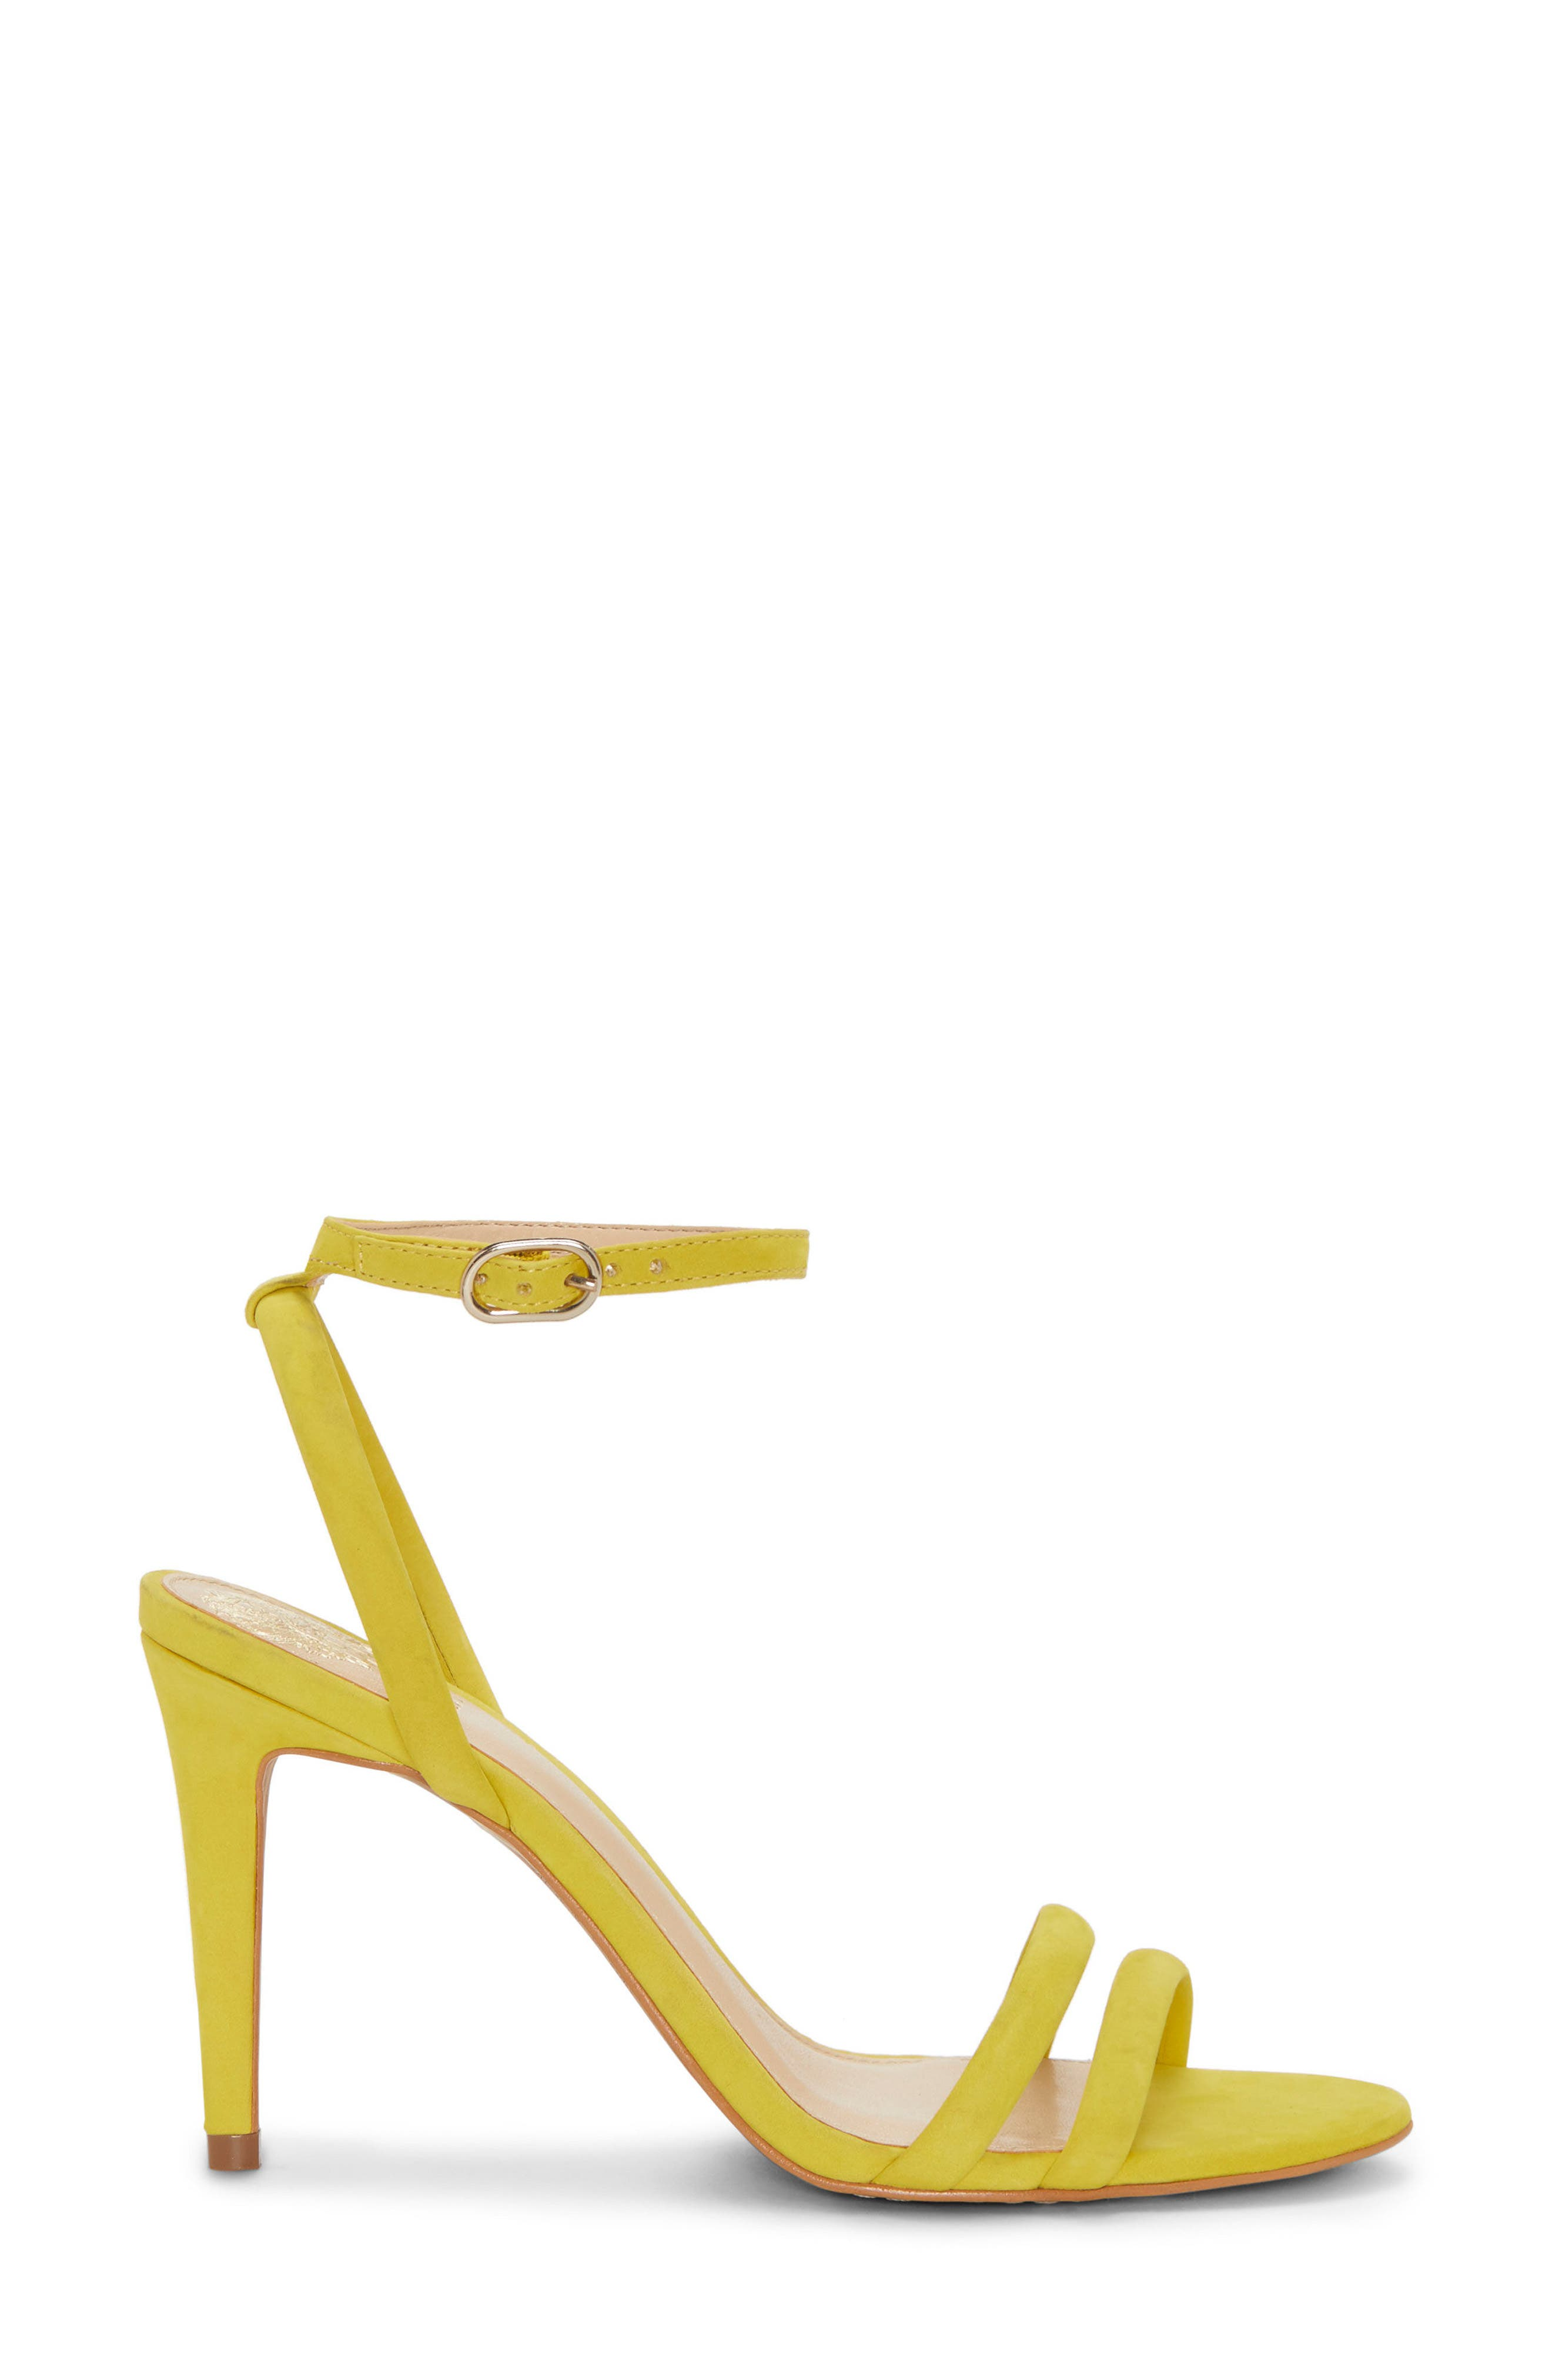 Kareenat Sandal,                             Alternate thumbnail 3, color,                             Yellow Nubuck Leather